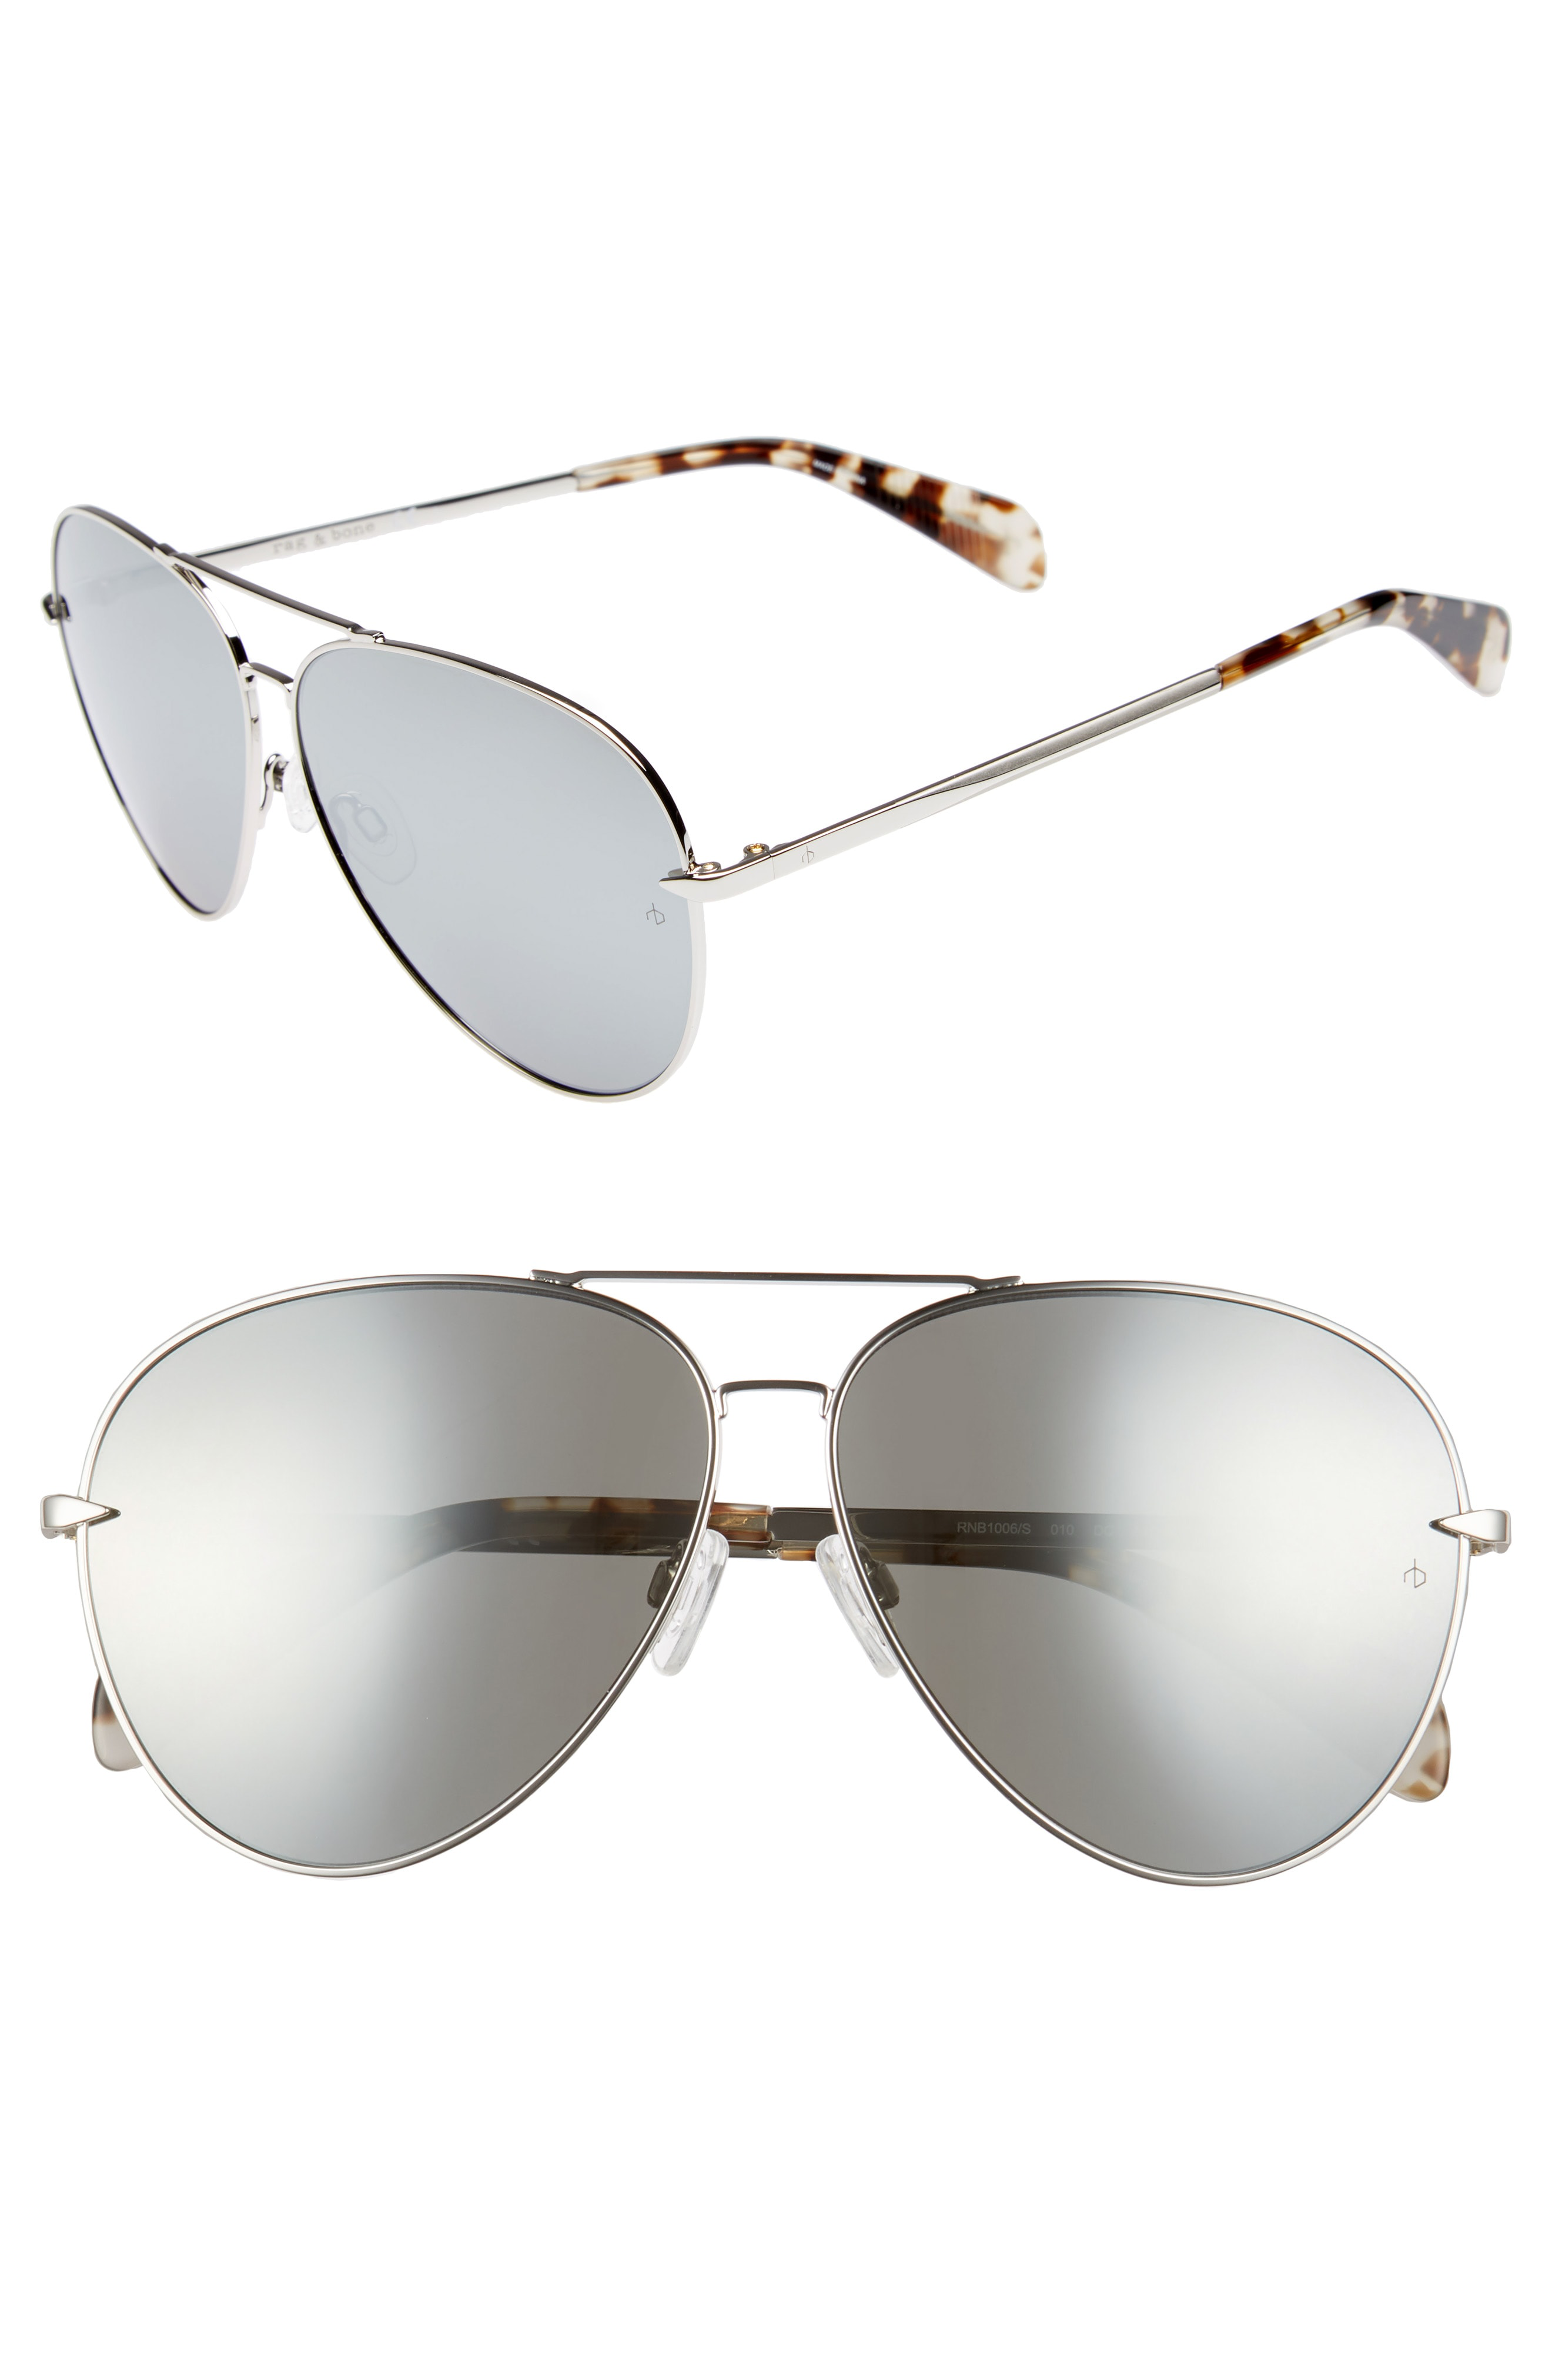 3b7785ab5cd2 Rag   Bone 63Mm Oversize Aviator Sunglasses - Palladium